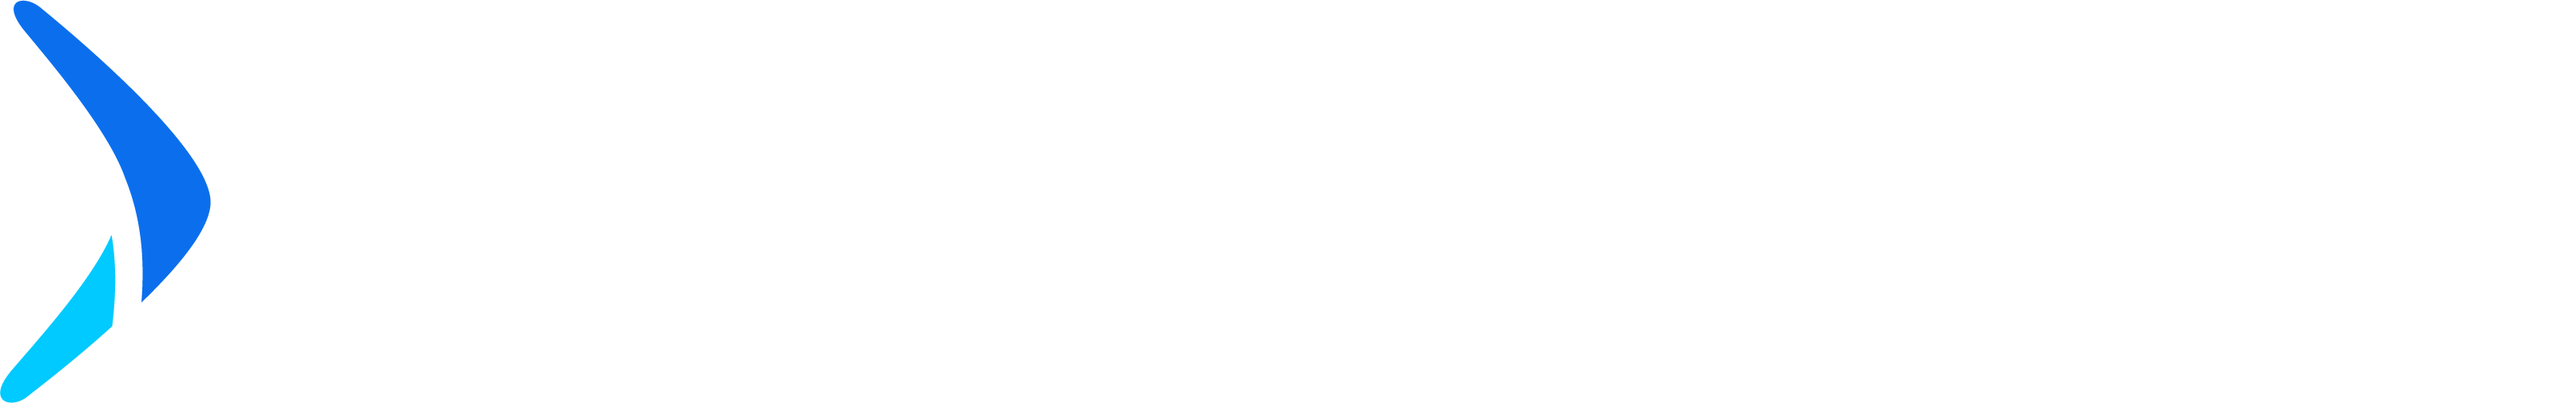 logo_sales-boomerange-white